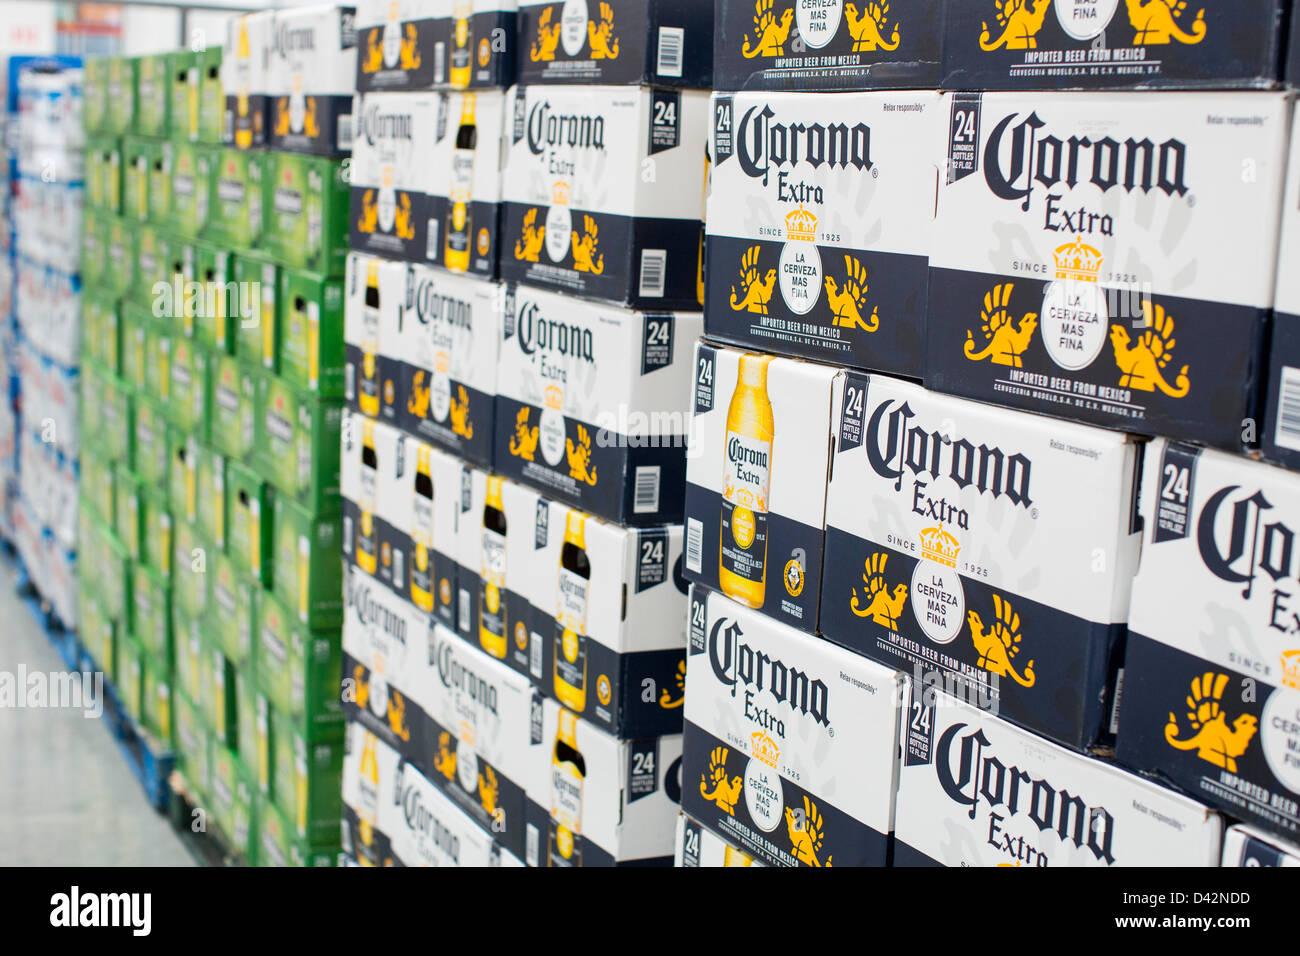 Corona beer on display at a costco wholesale warehouse club stock corona beer on display at a costco wholesale warehouse club thecheapjerseys Images